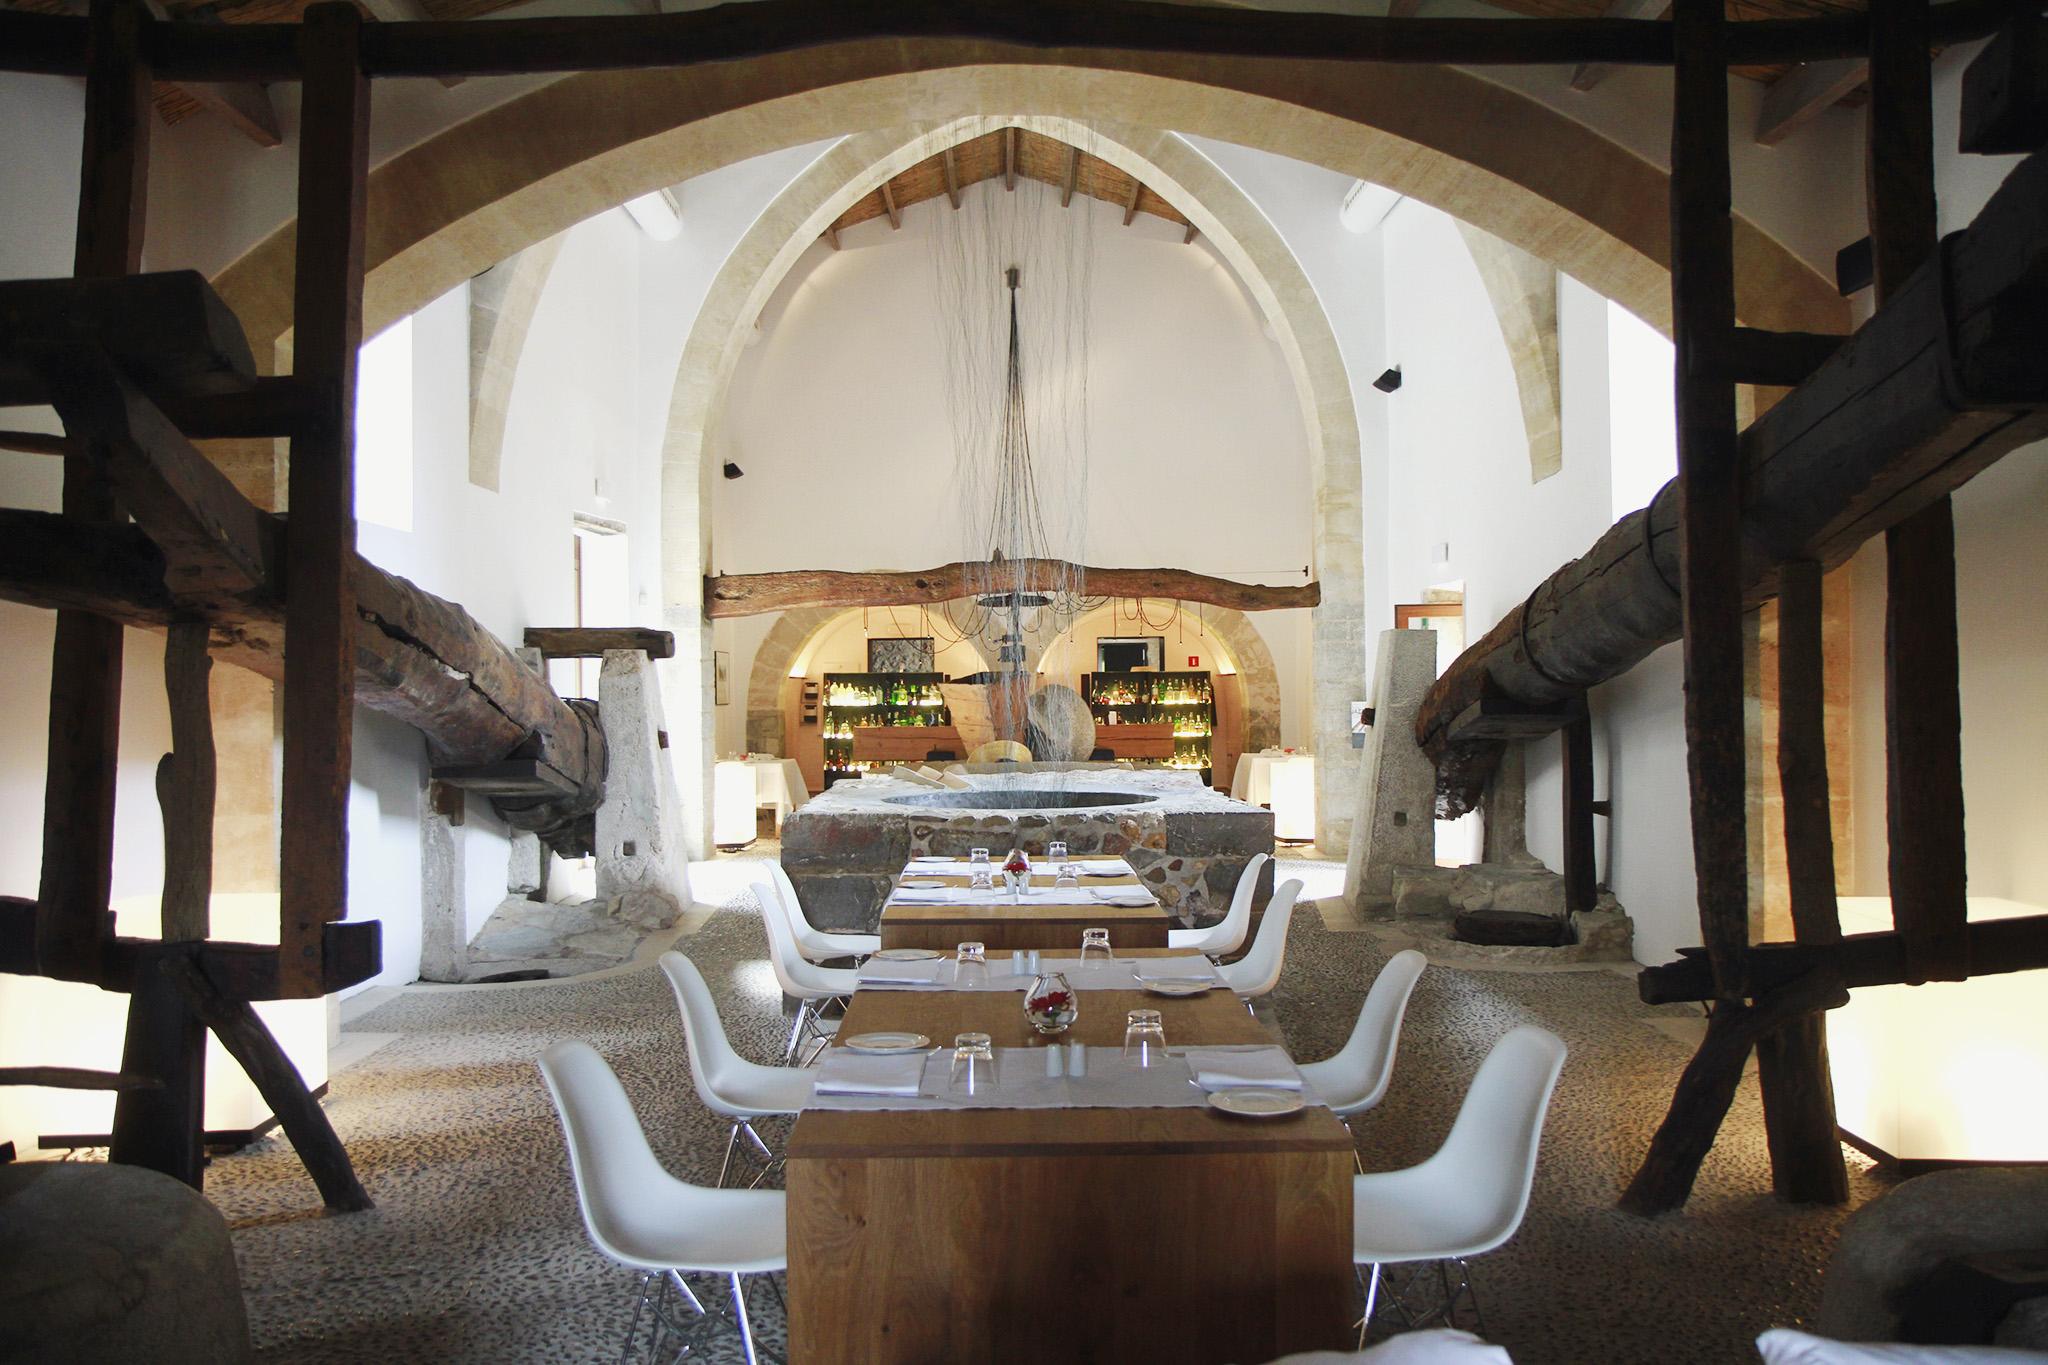 2017-04-Son-Brull - son-brull-hotel-spa-mallorca-nectarandpulse-restaurant-16.jpg